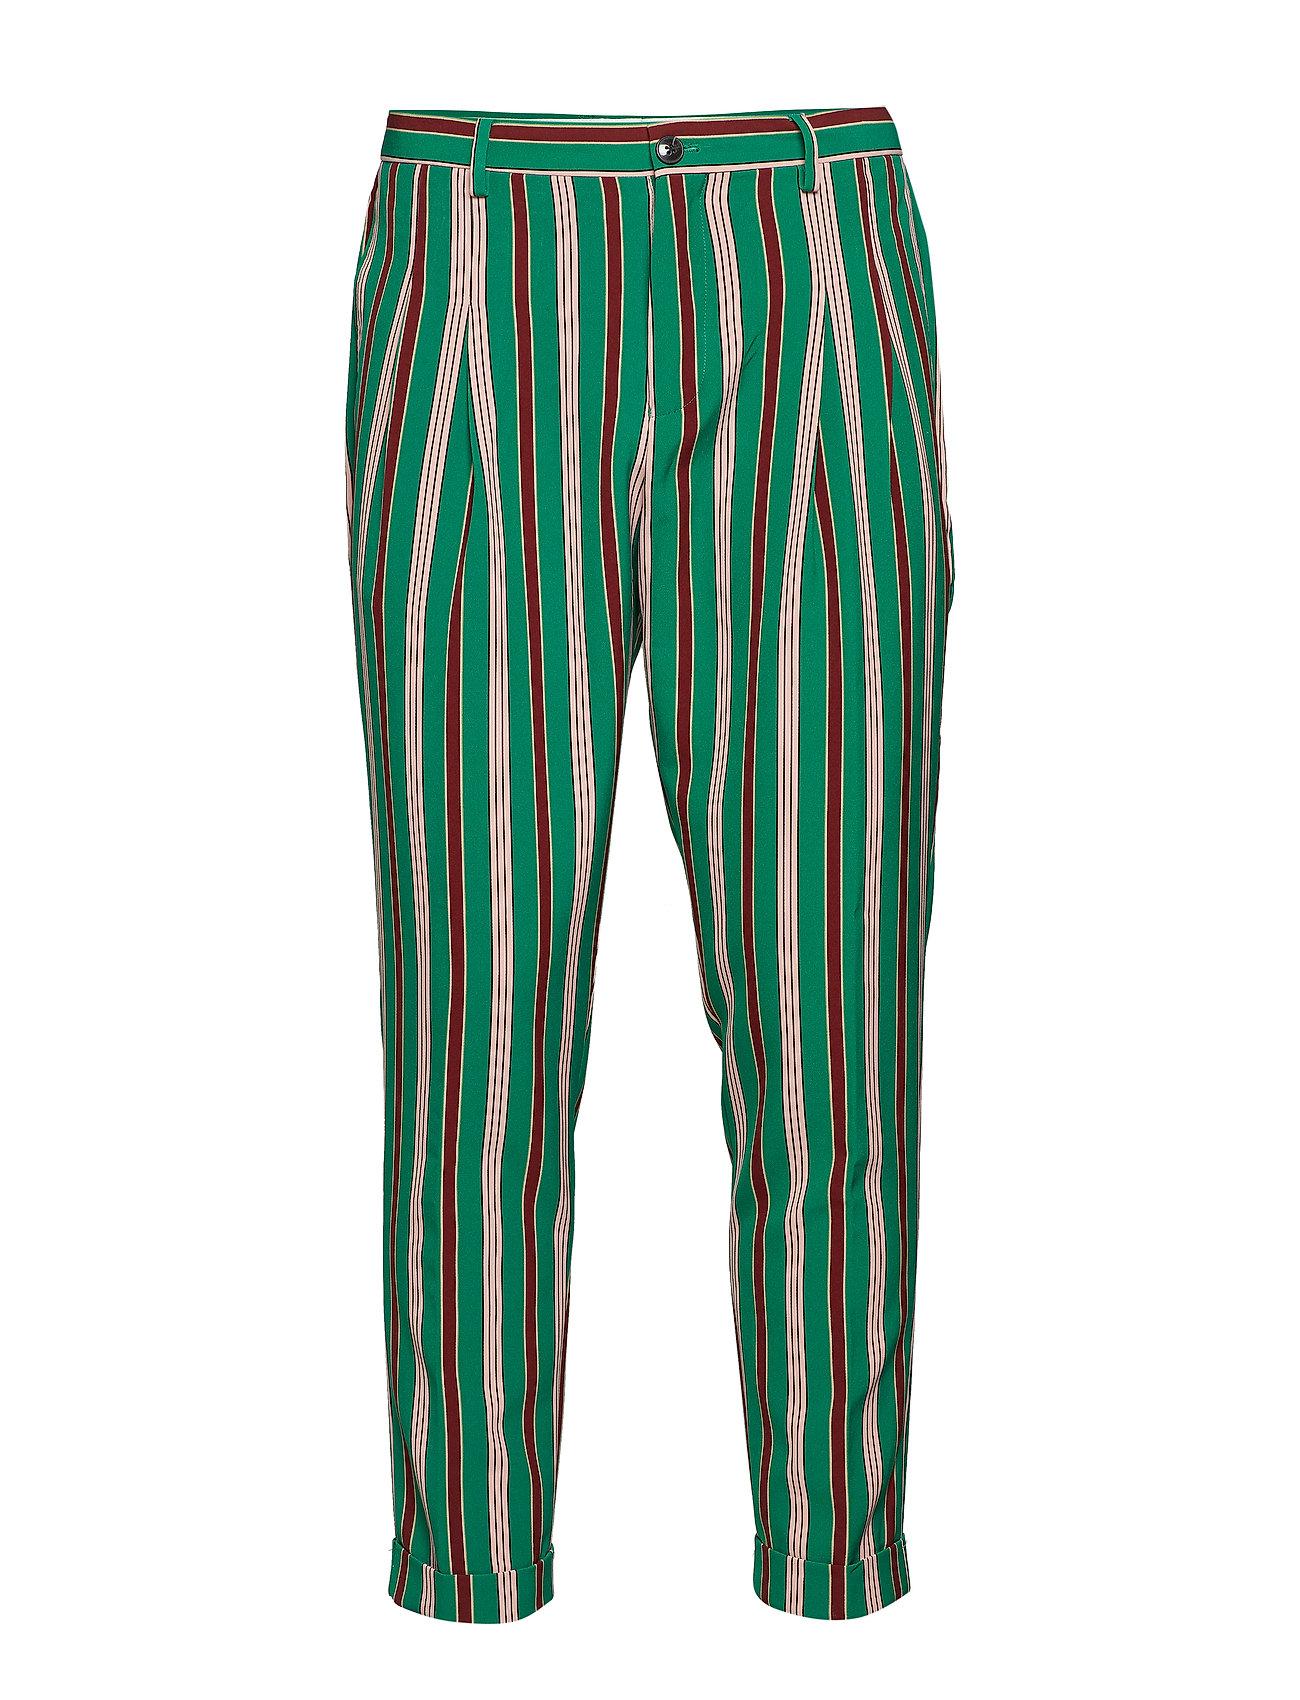 SCOTCH & SODA Twilt - Pleated Chino In Bright Printed Stripe Pattern